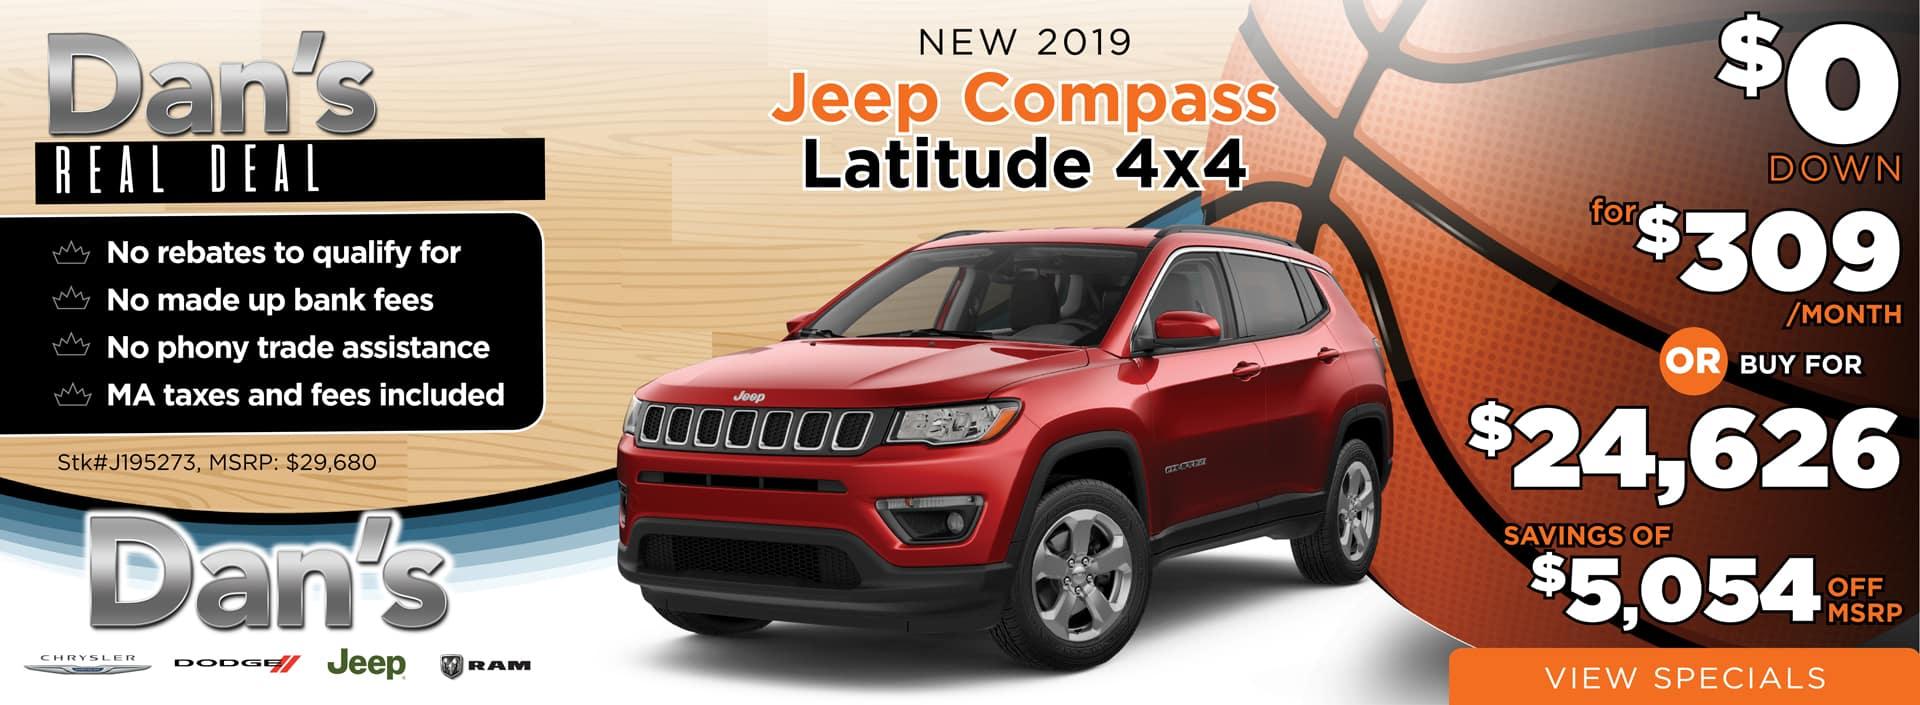 2019 Jeep_Compass